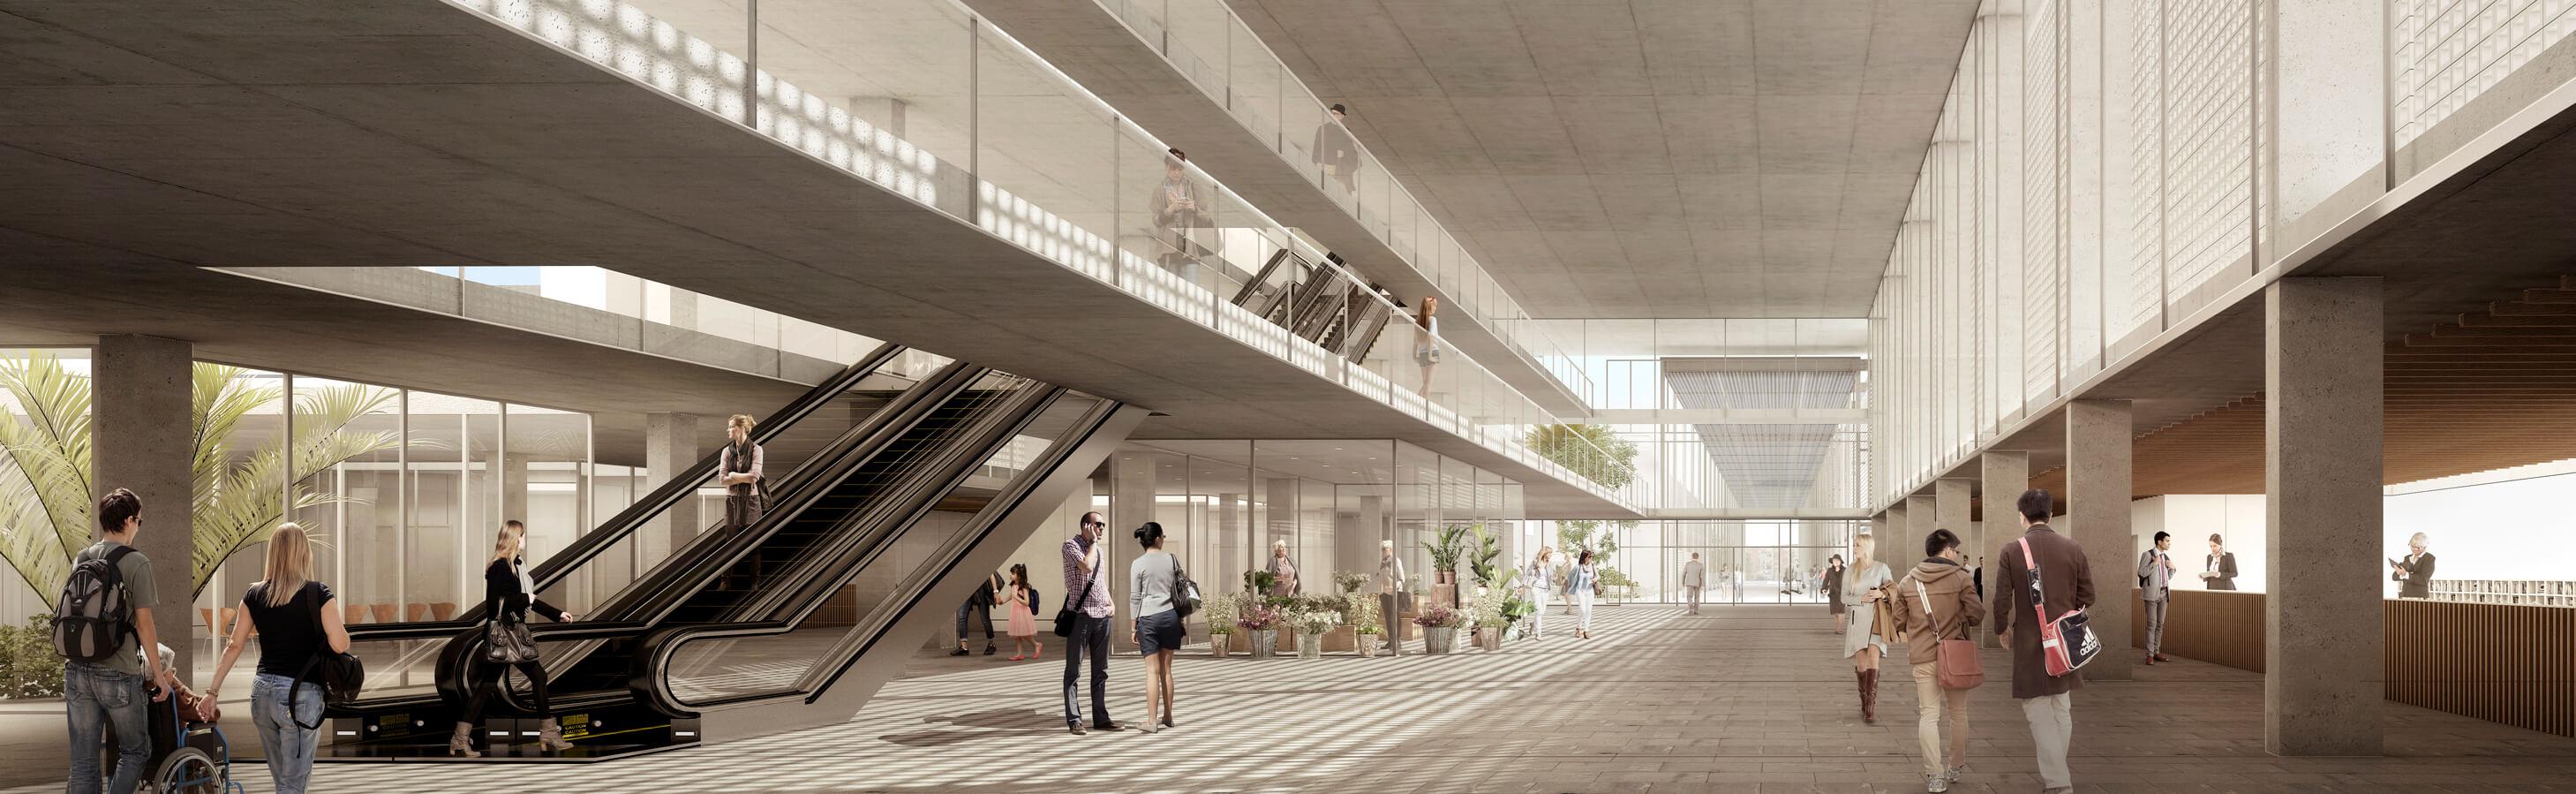 45-Hospital Joan XXIII- Sanabria & Corea & CDB Arquitectura